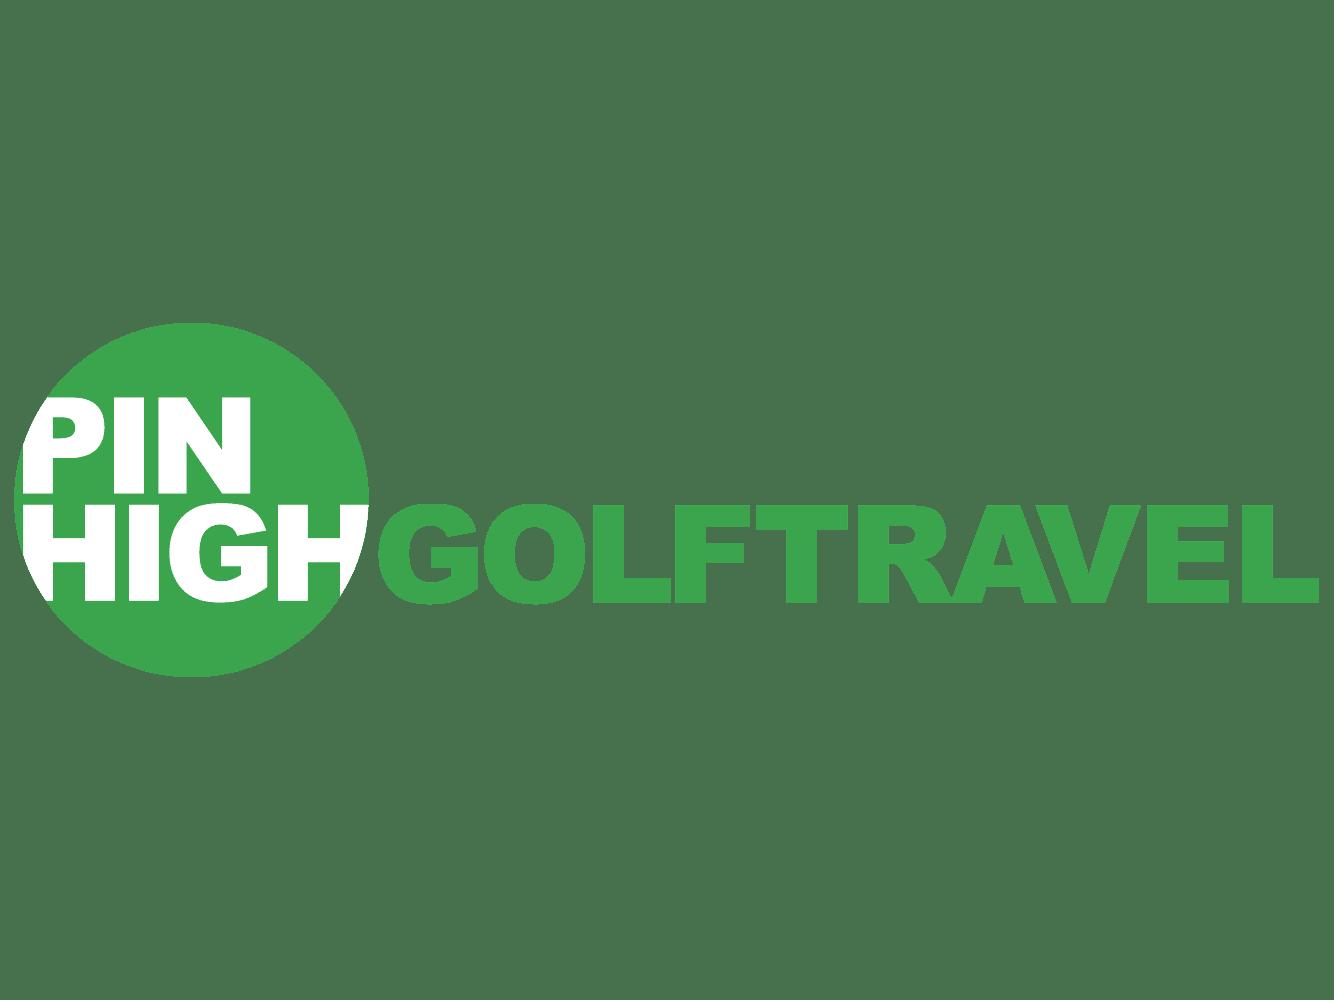 Logo Pin High Golftravel